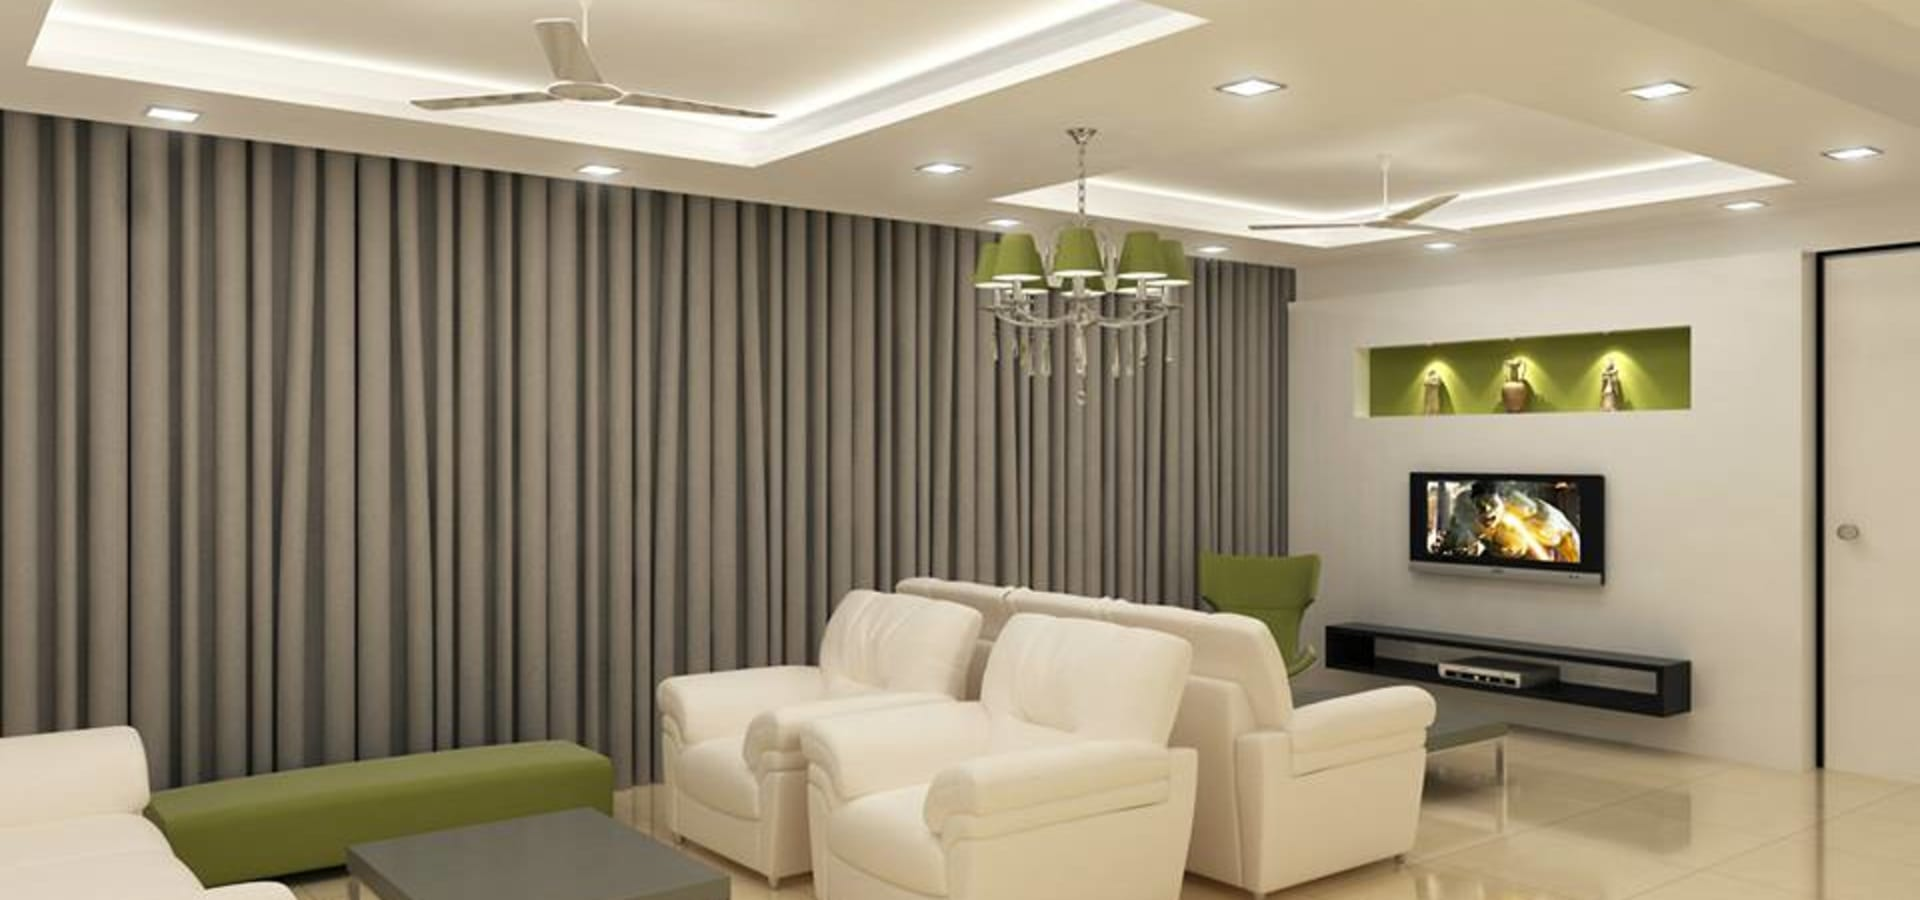 Kunal & Associates